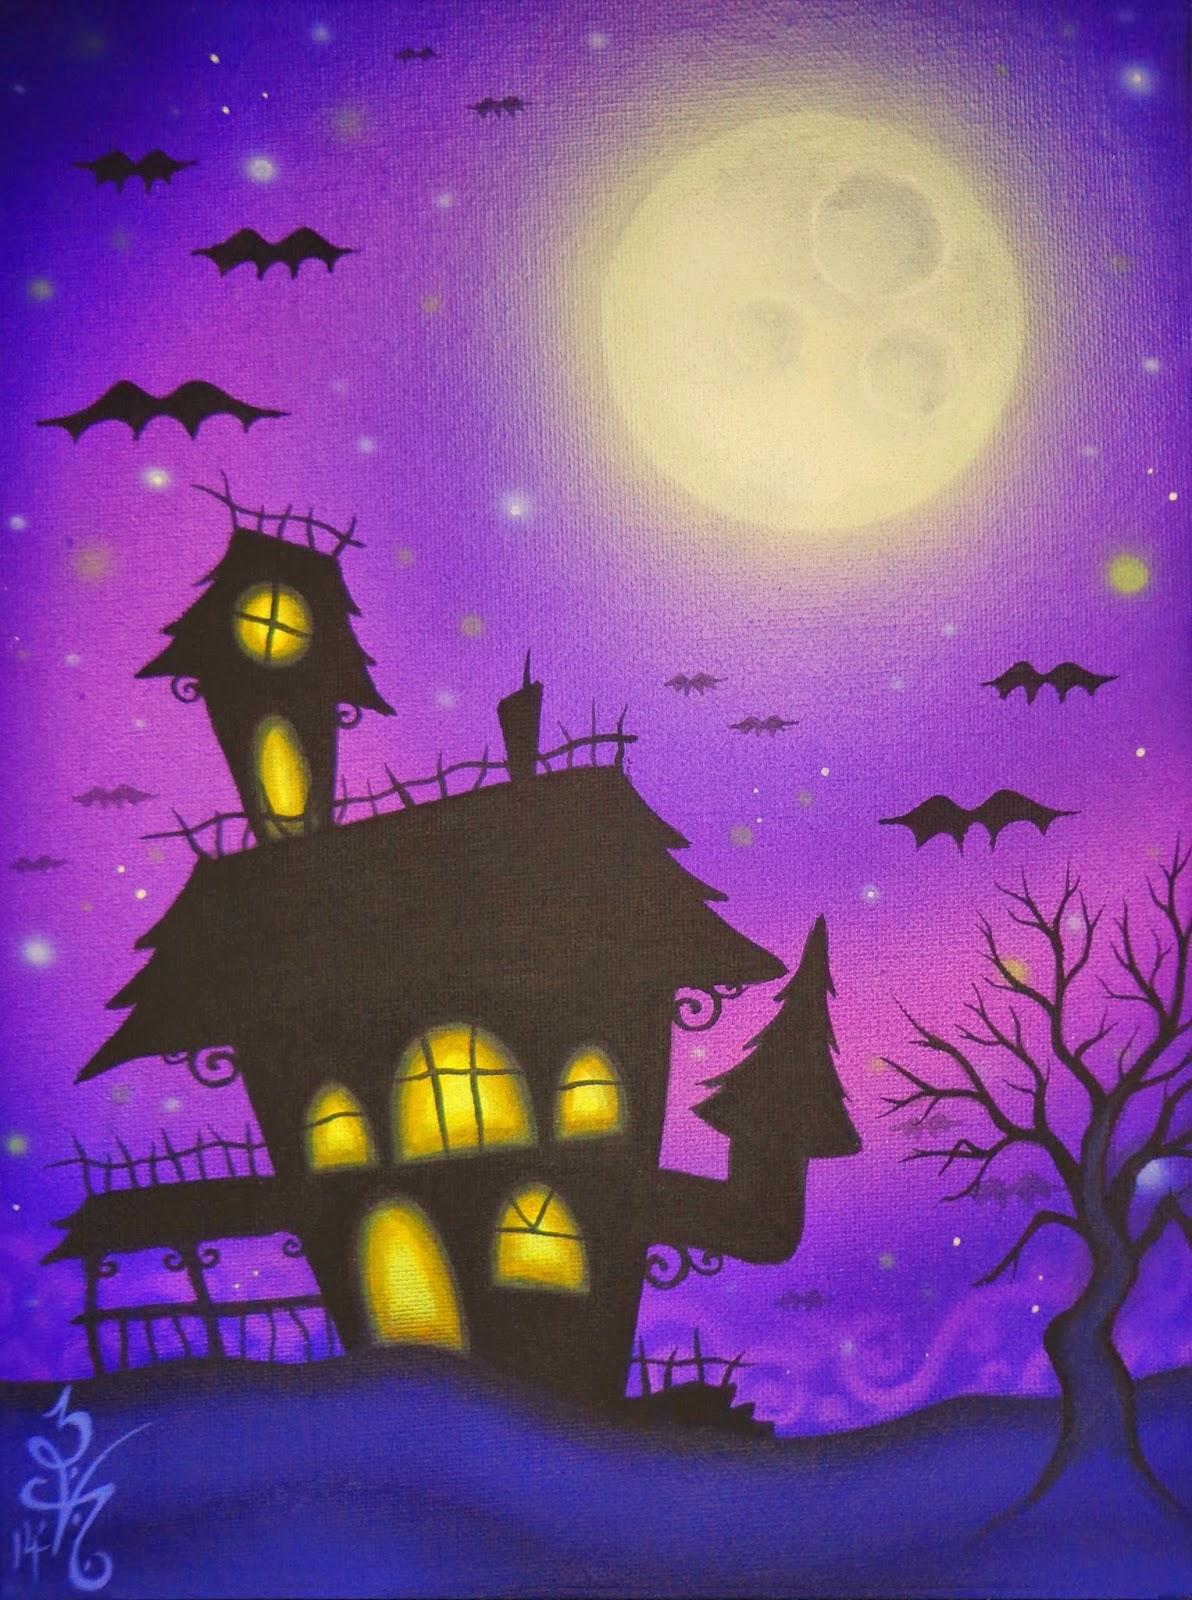 https://www.etsy.com/listing/202750856/original-gothic-fantasy-halloween?ref=shop_home_active_1